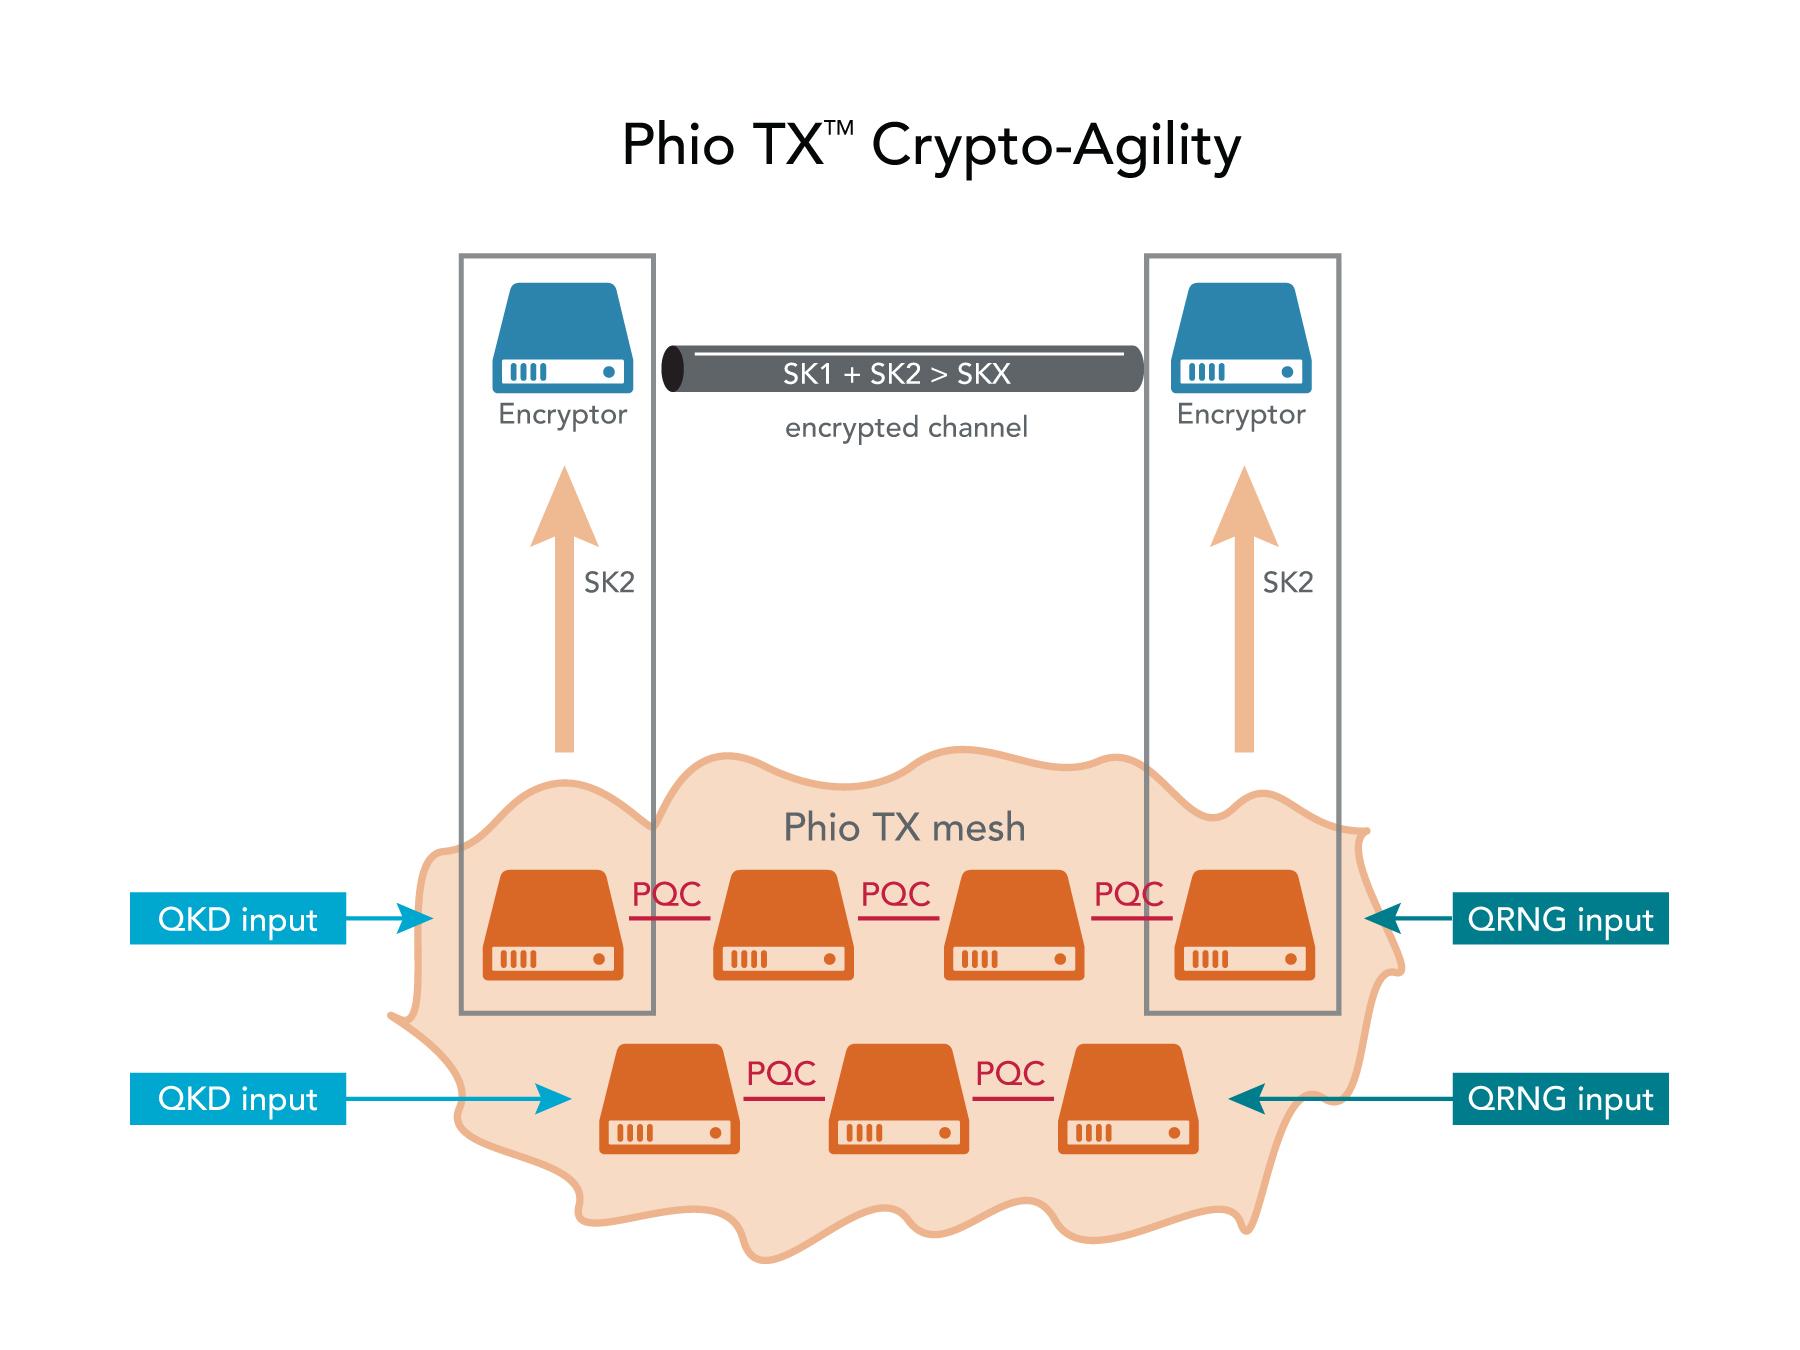 Phio TX Crypto-agility